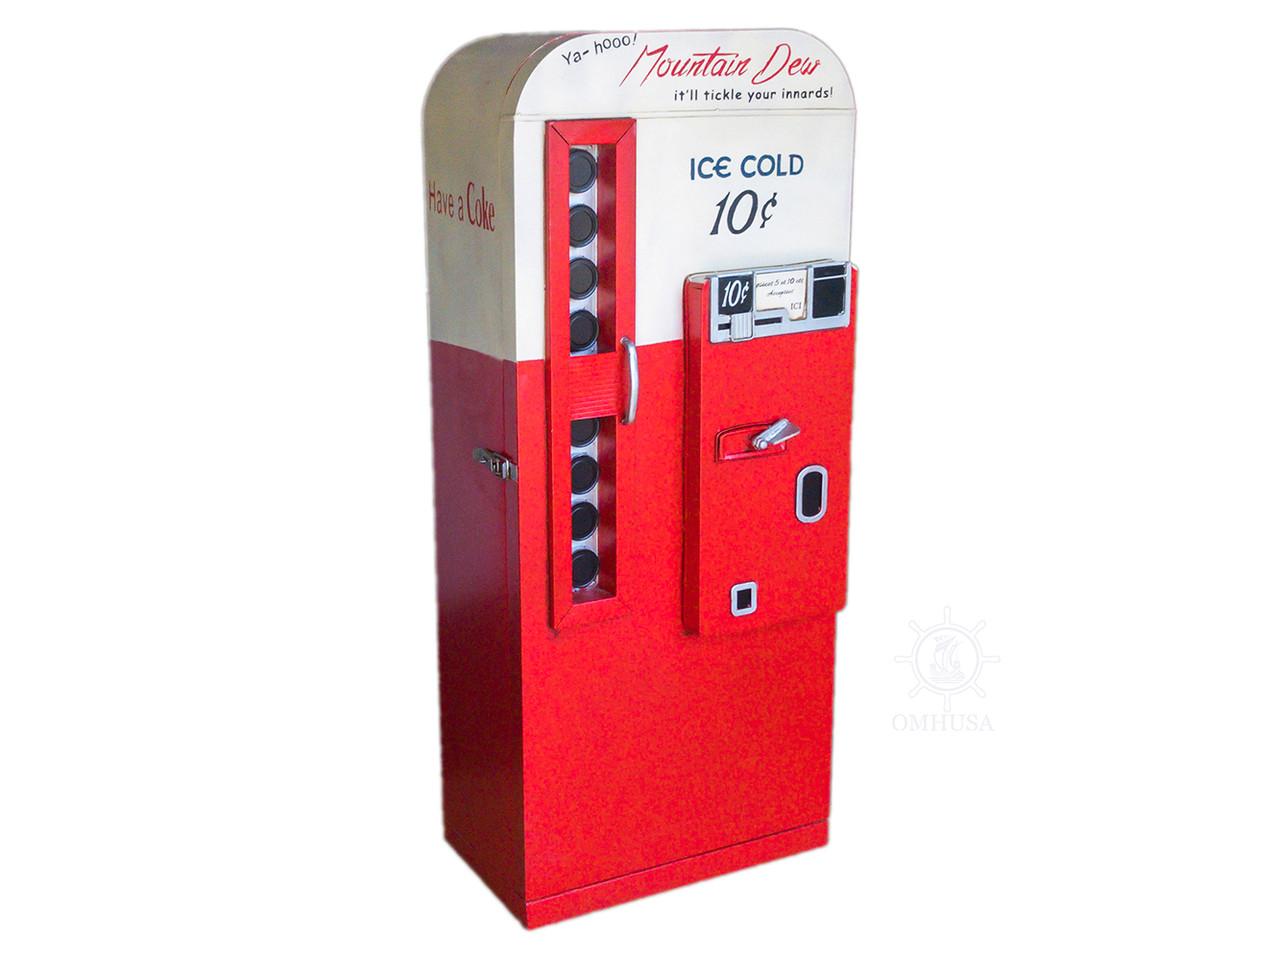 Mountain Dew Coke Soda Pop Vending Machine Cabinet